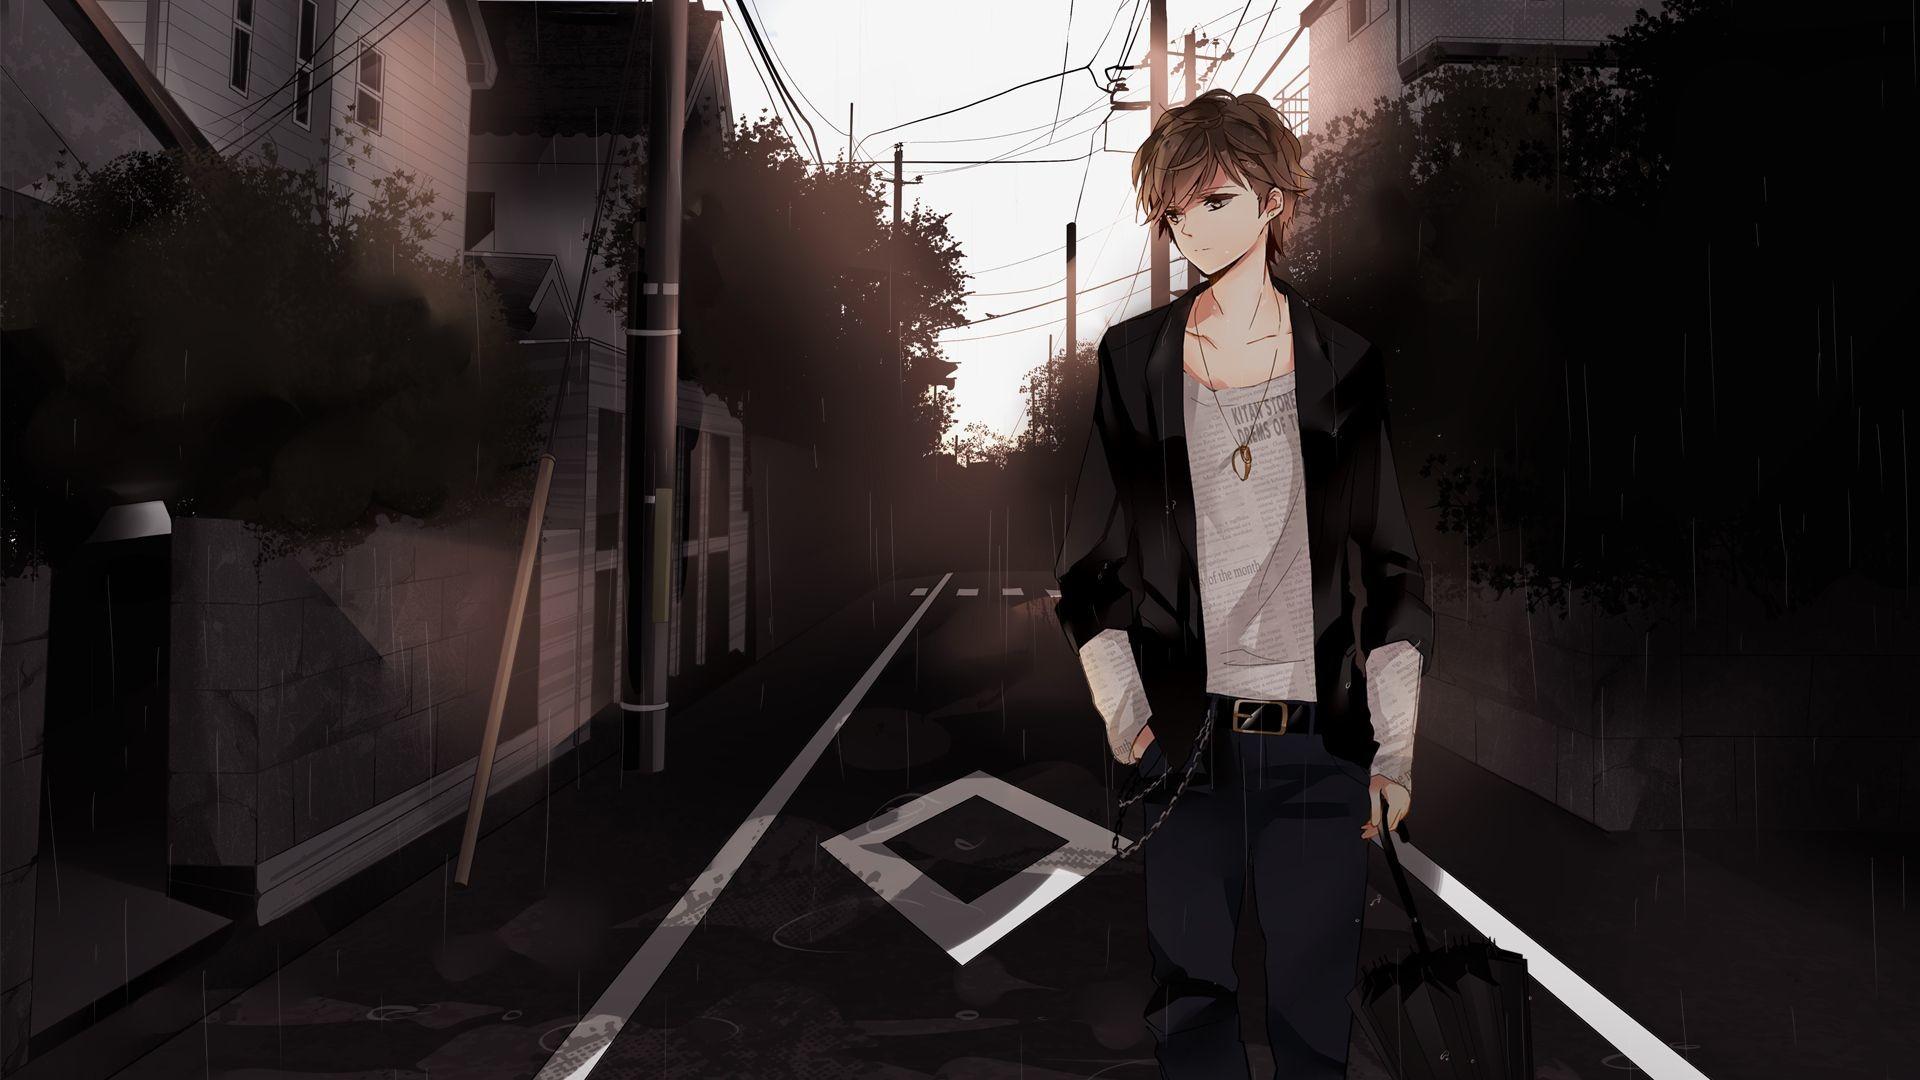 Sad Anime Boy Image 1080p